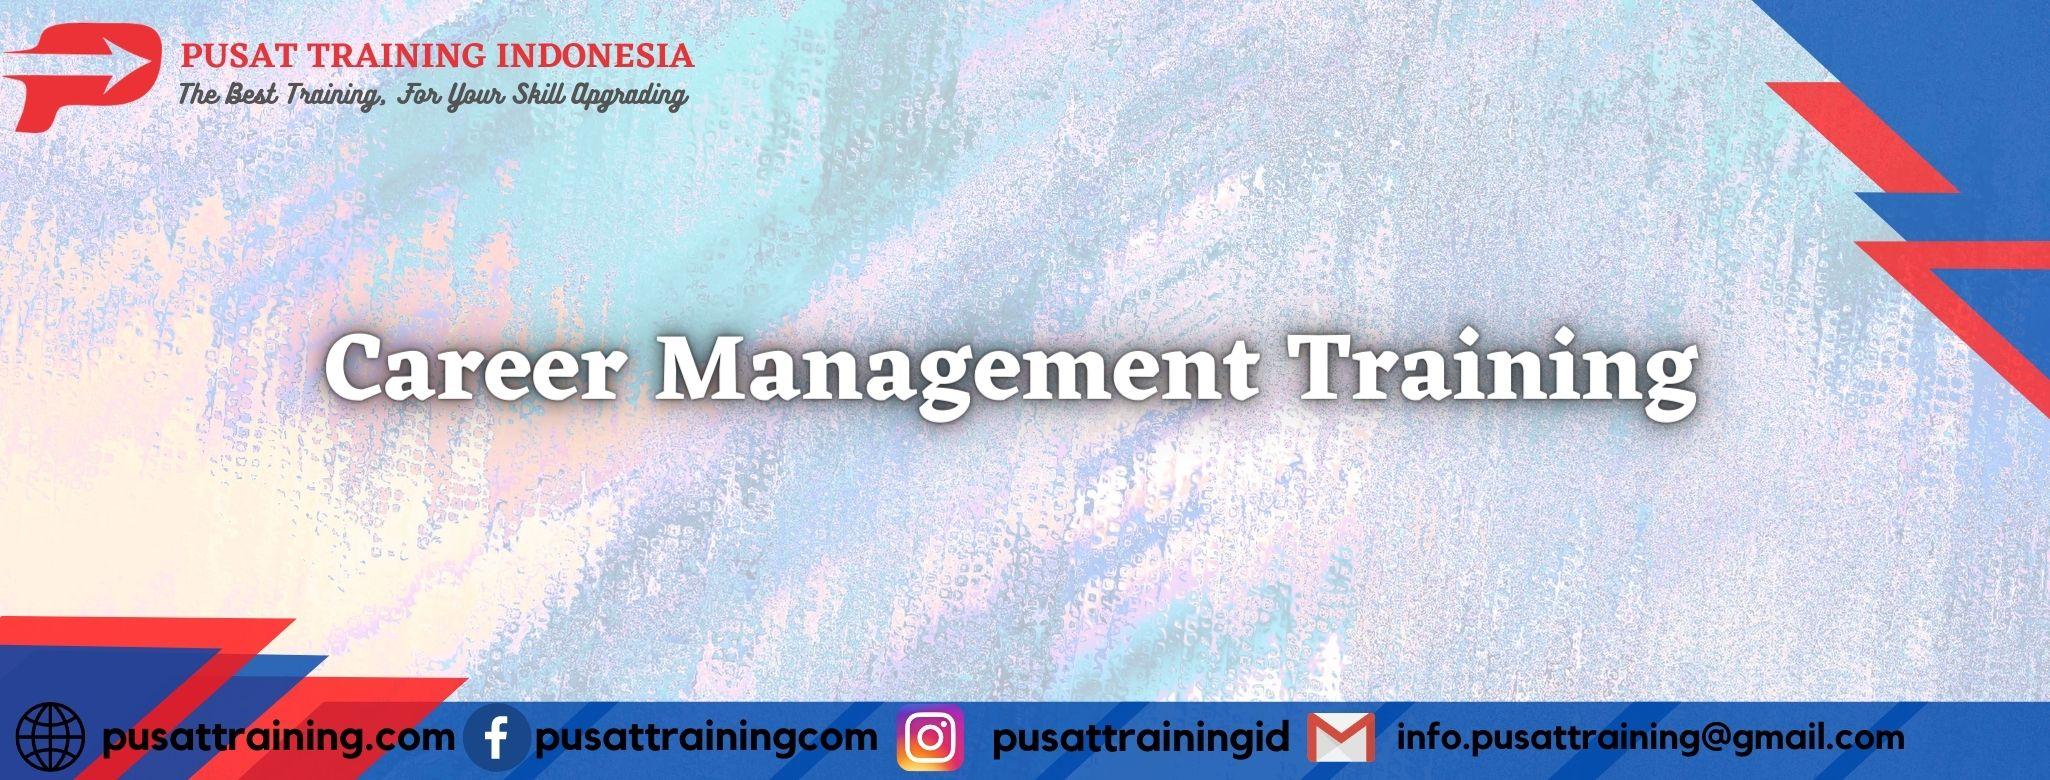 Career-Management-Training